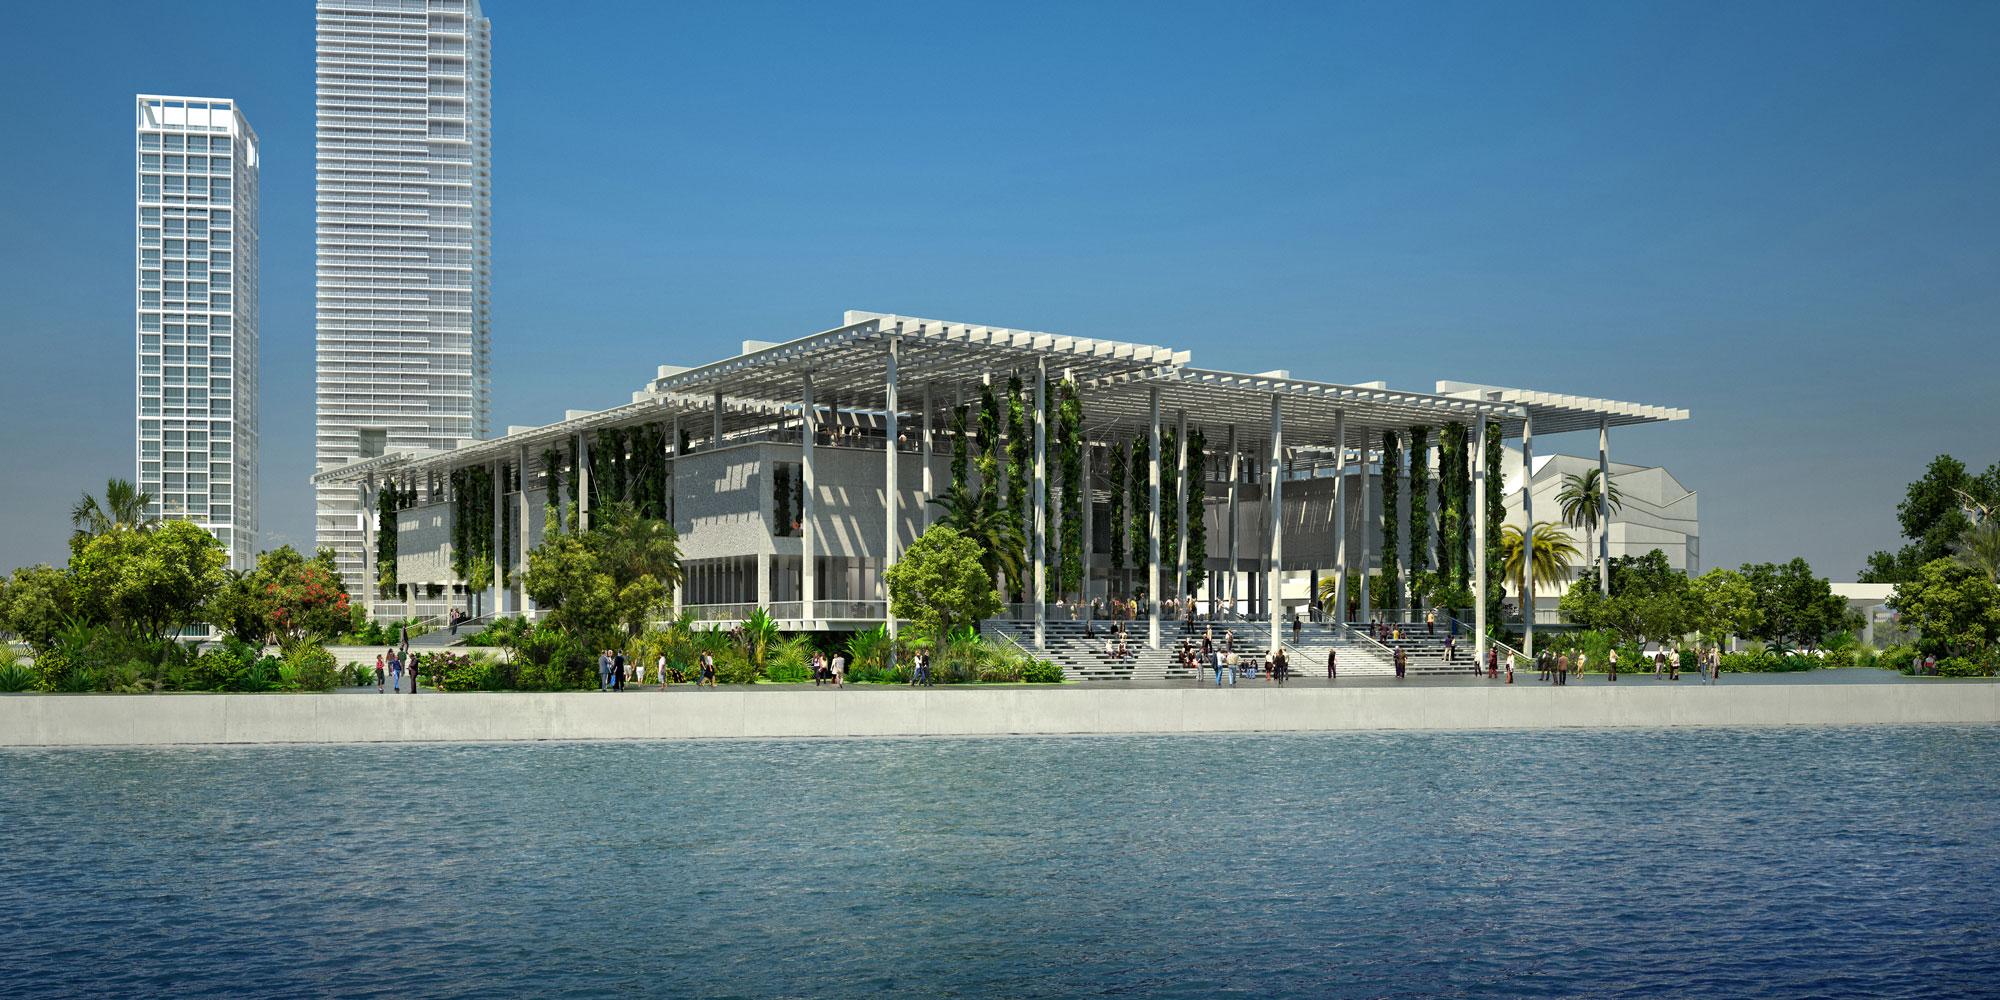 Perez Art Museum Miami (PAMM)